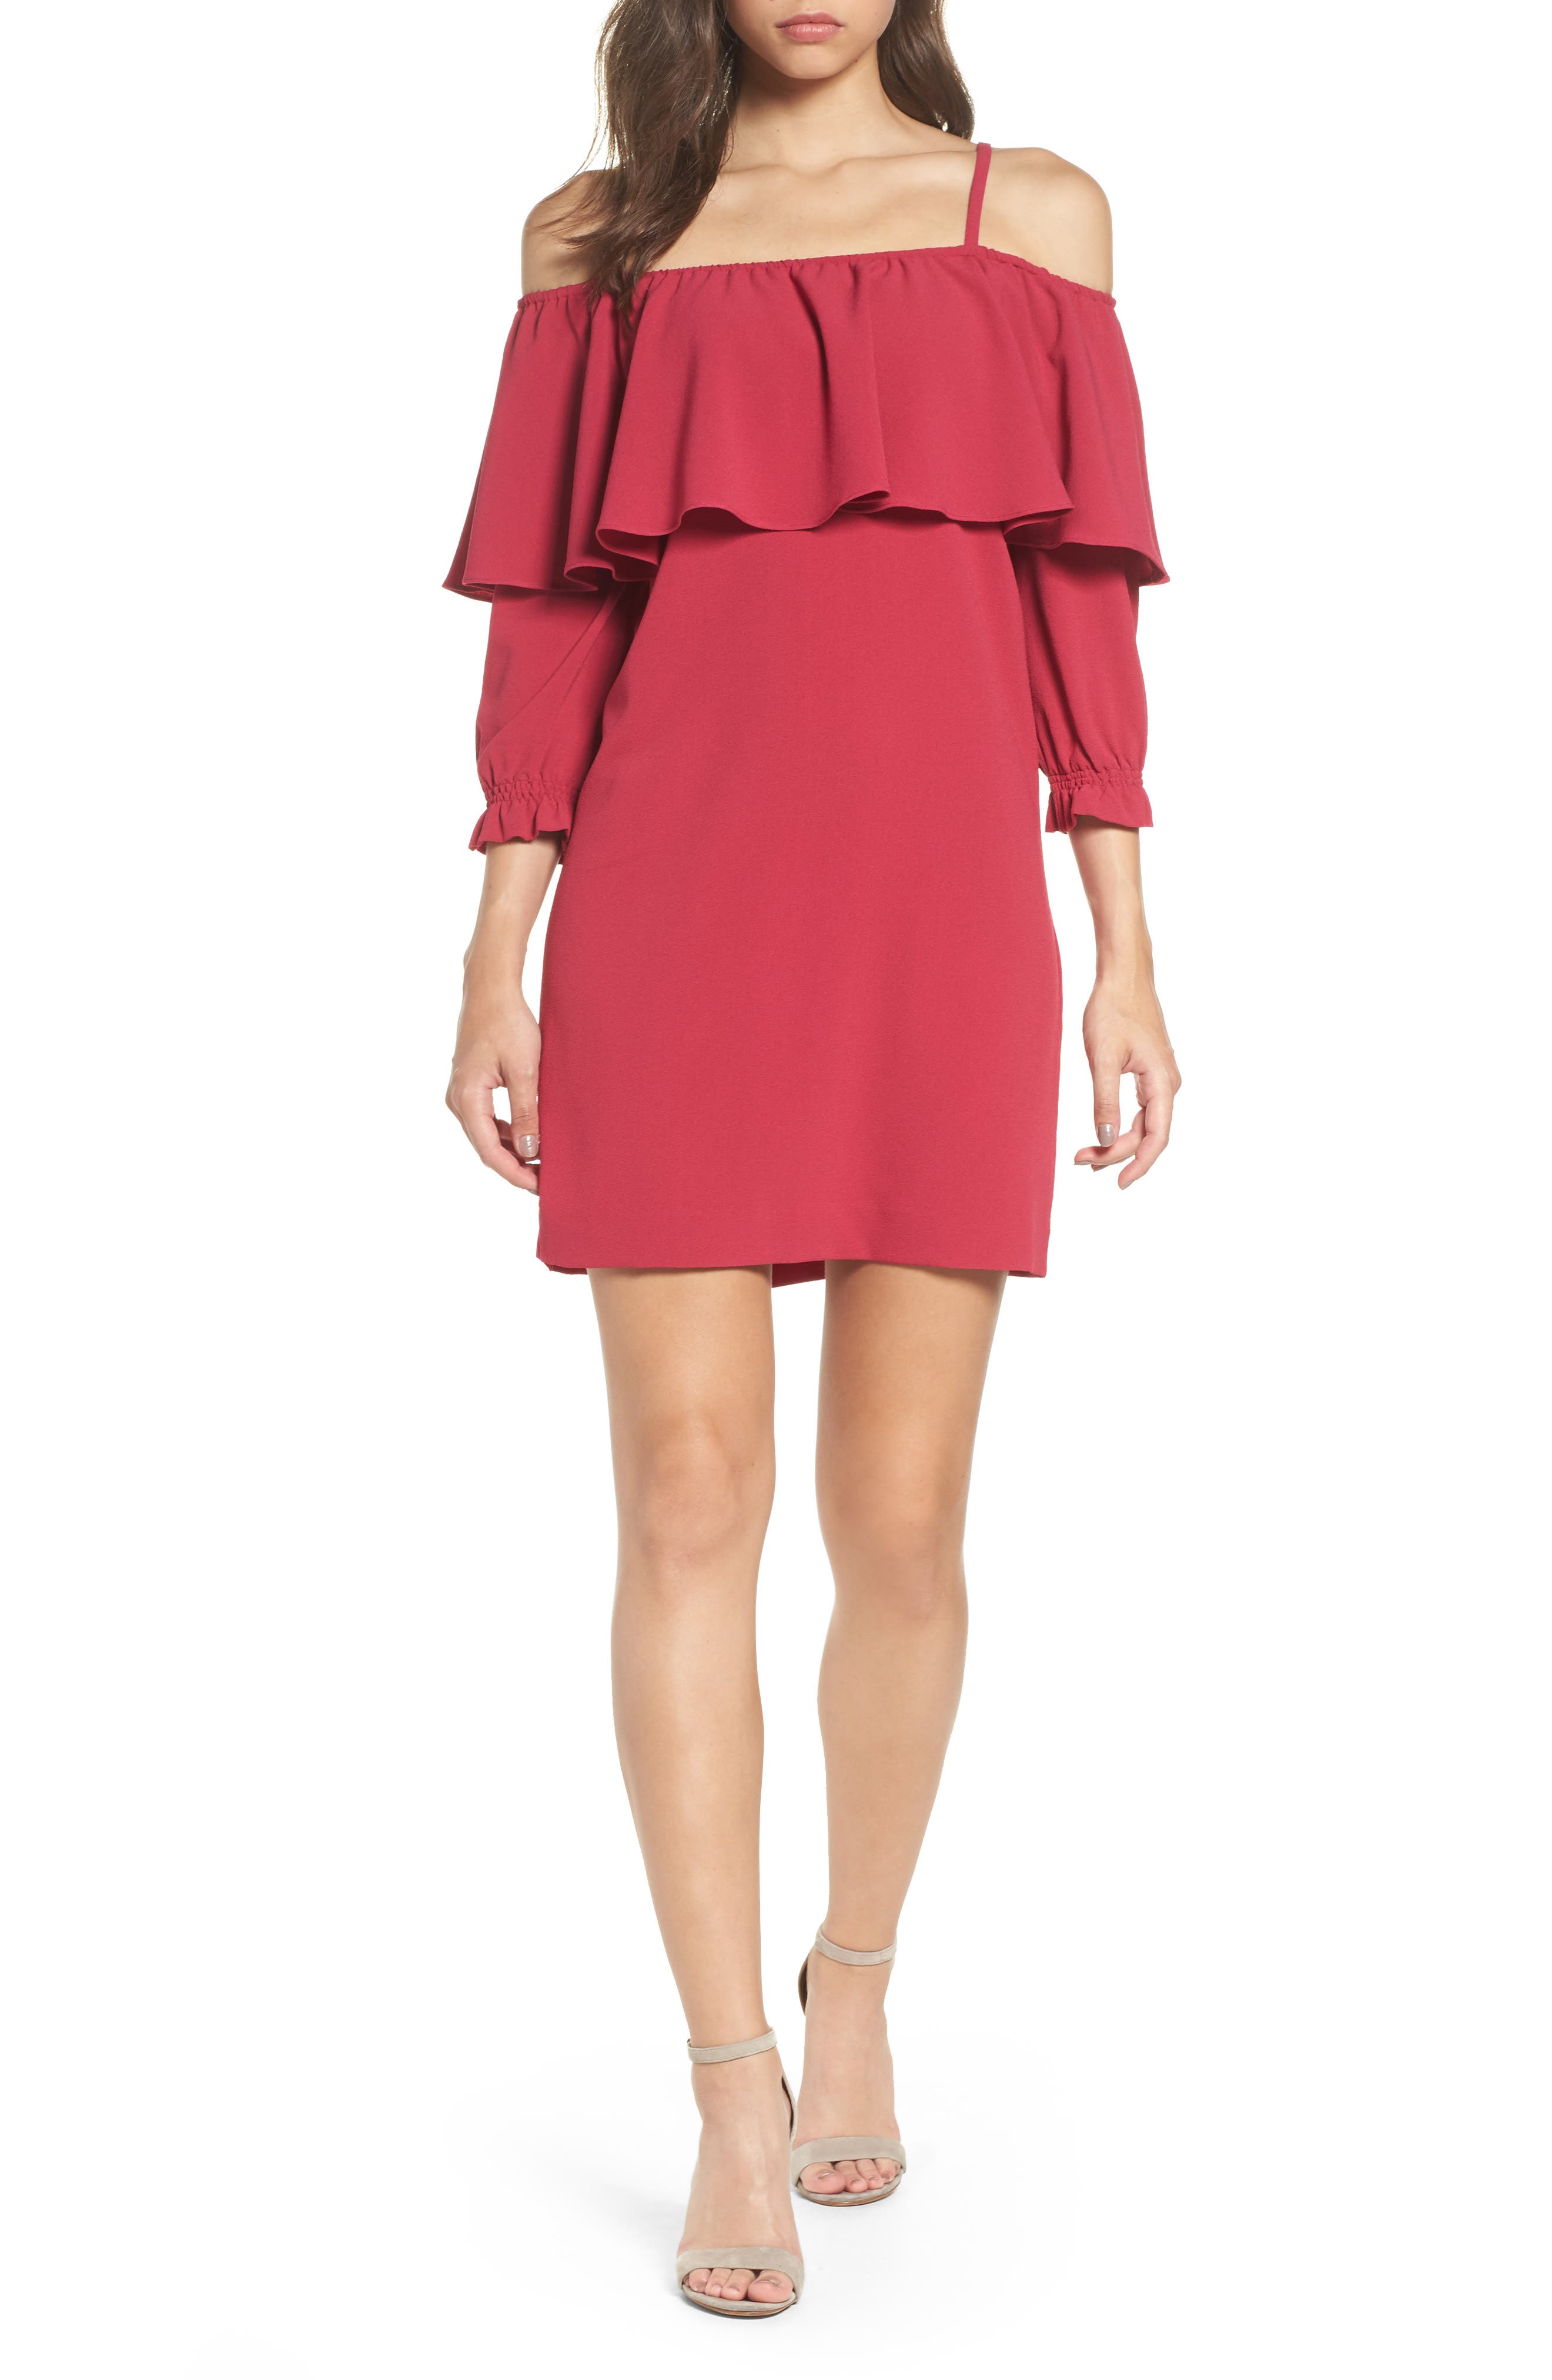 FELICITY & COCO Ruffle Cold Shoulder Shift Dress